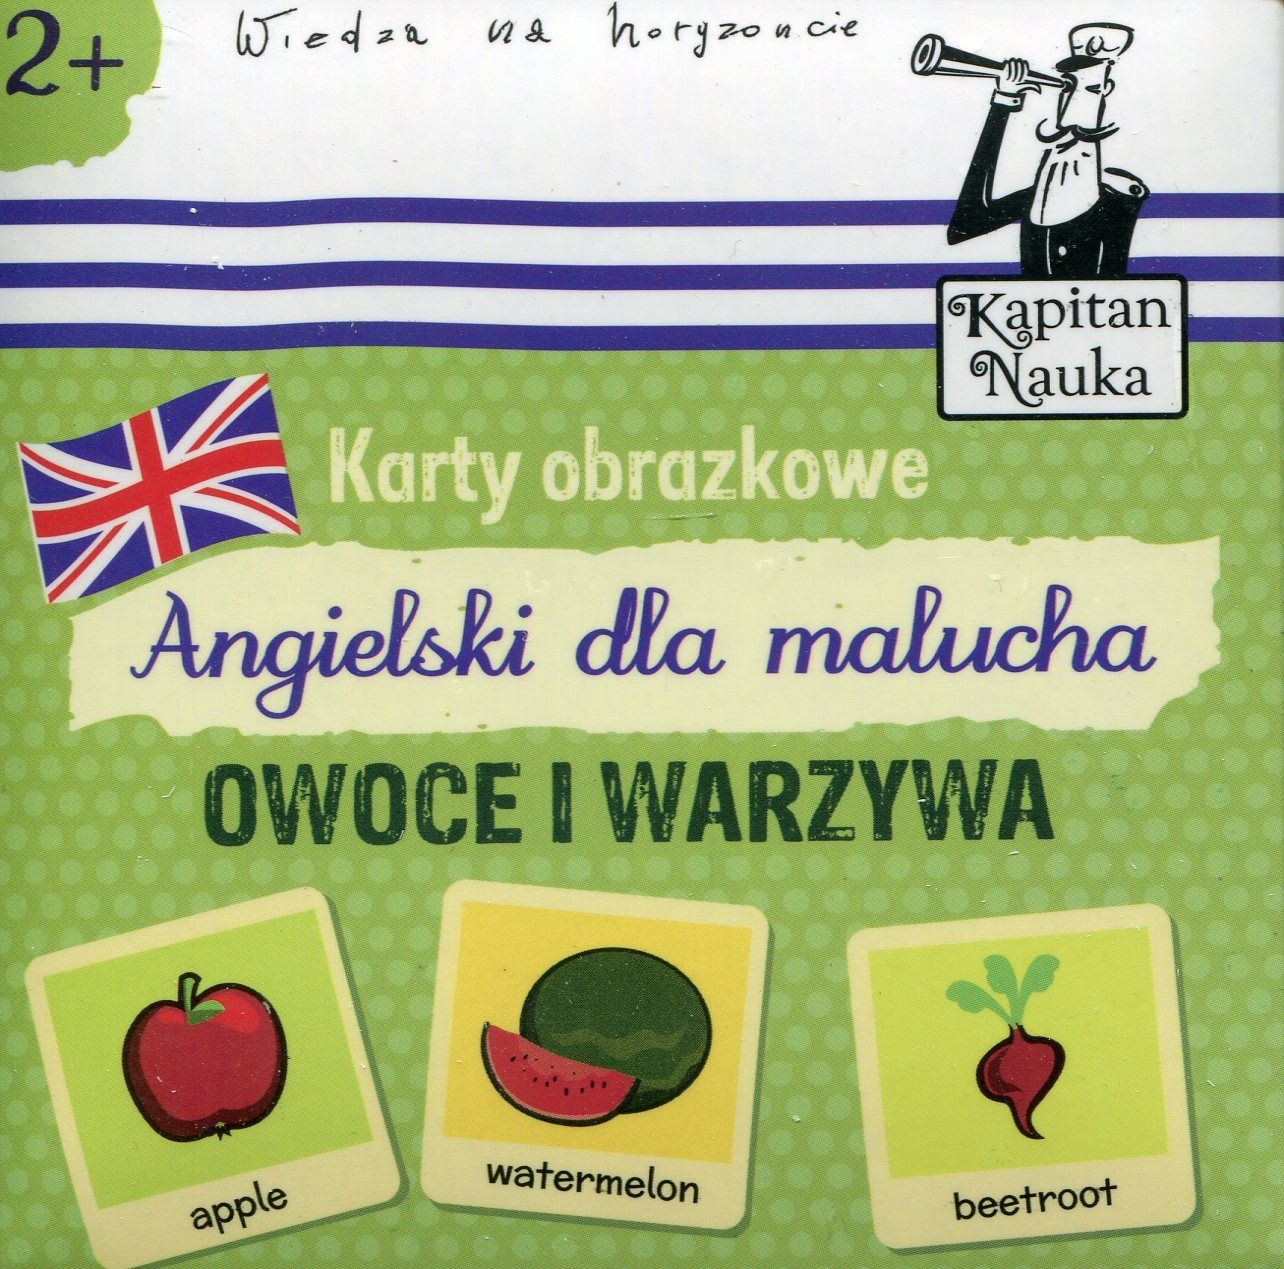 Kapitan Nauka Karty Obrazkowe Angielski Dla Malucha Owoce